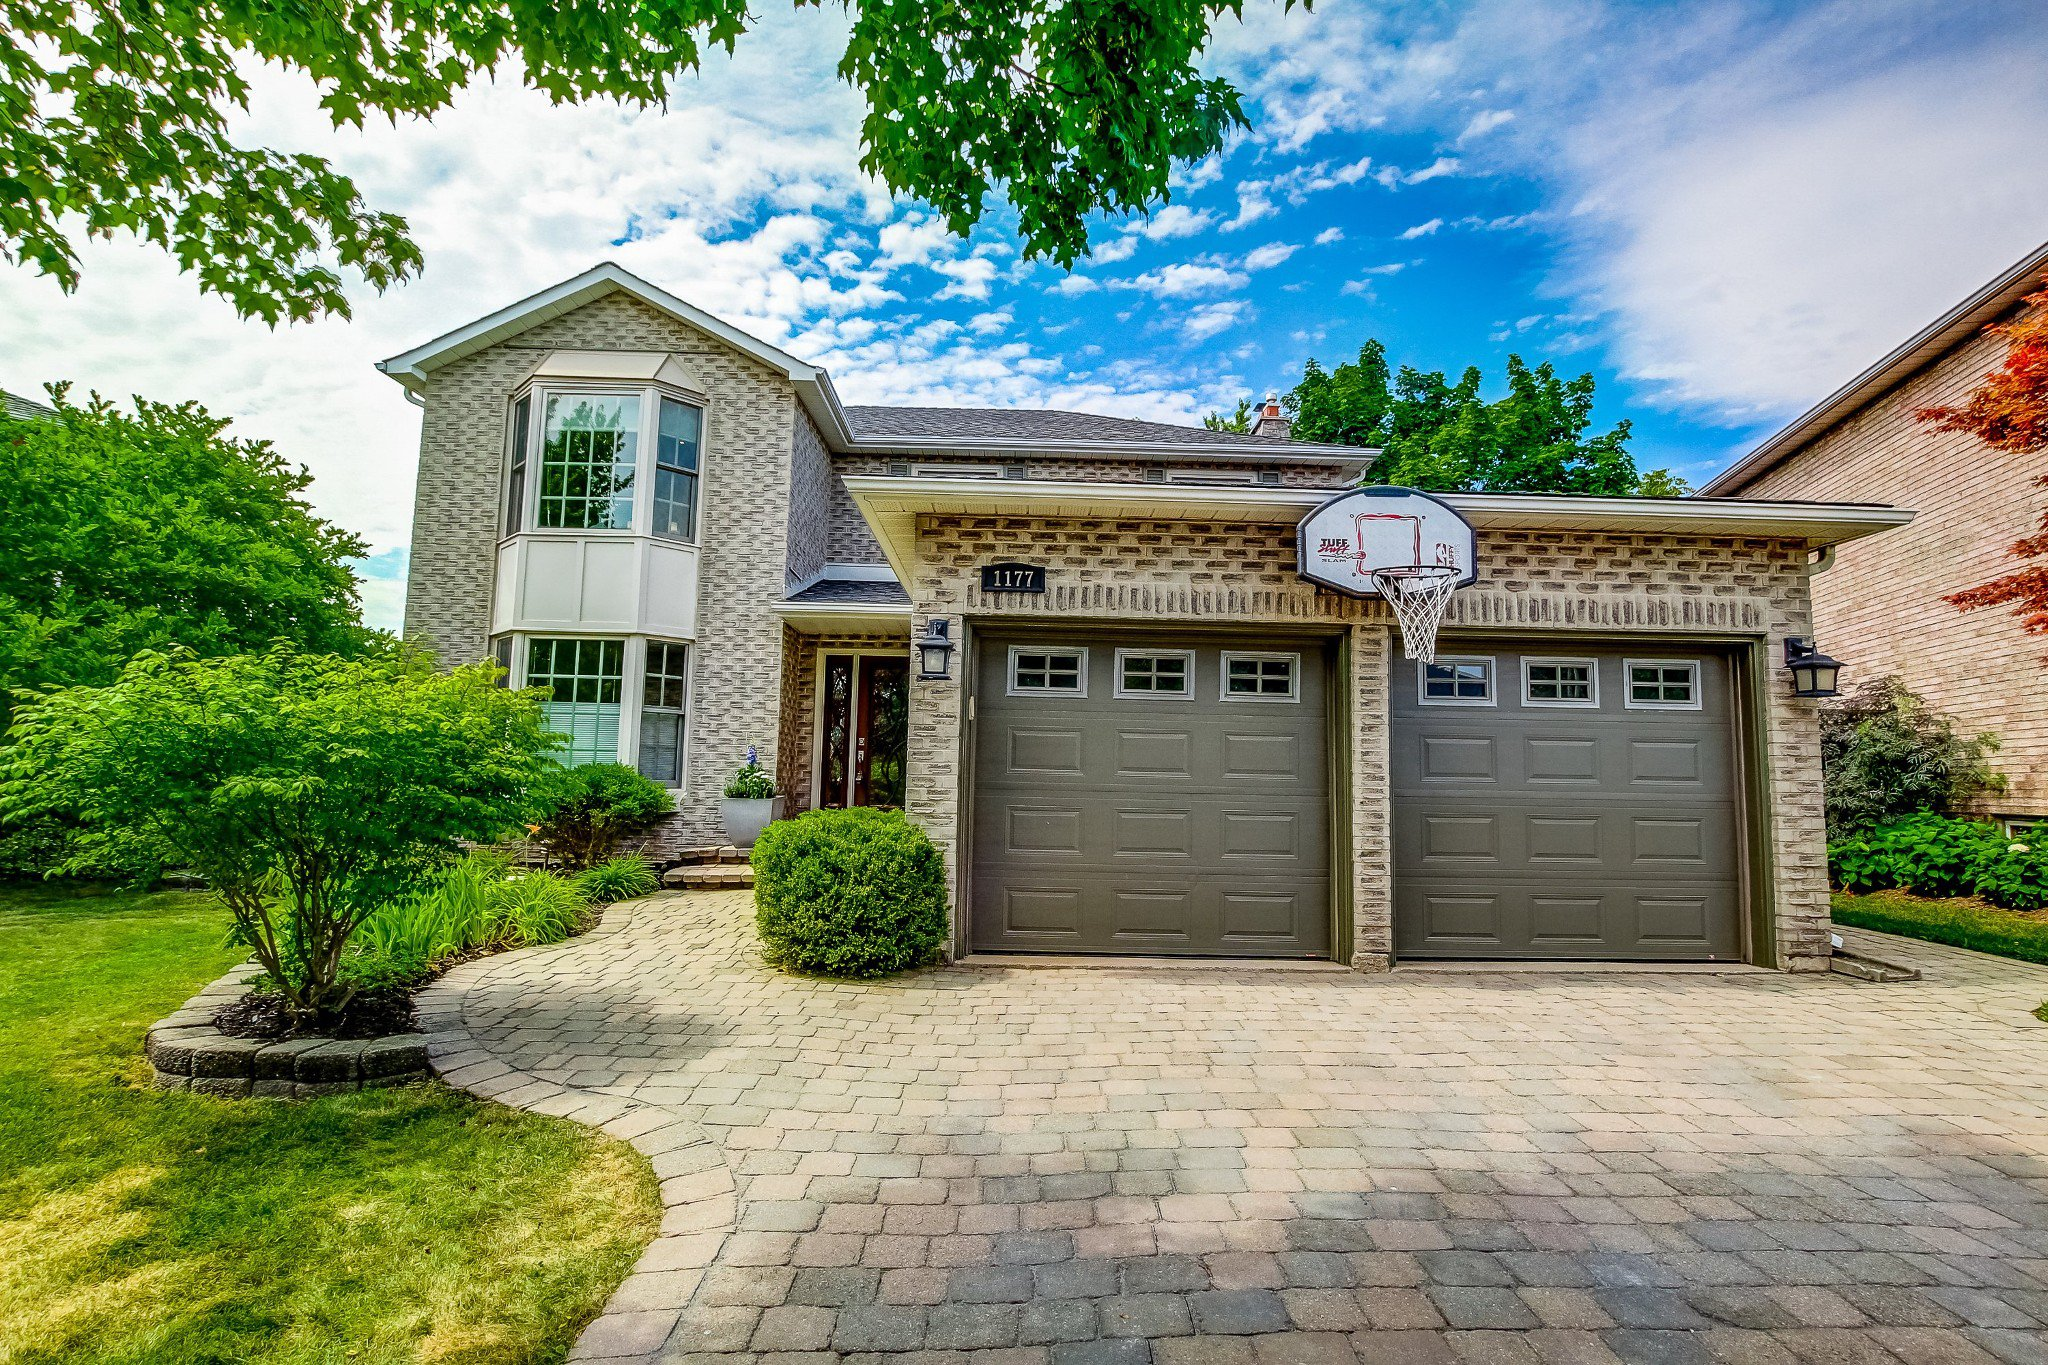 Main Photo: 1177 Ballantry Road in Oakville: Iroquois Ridge North House (2-Storey) for sale : MLS®# W4840274